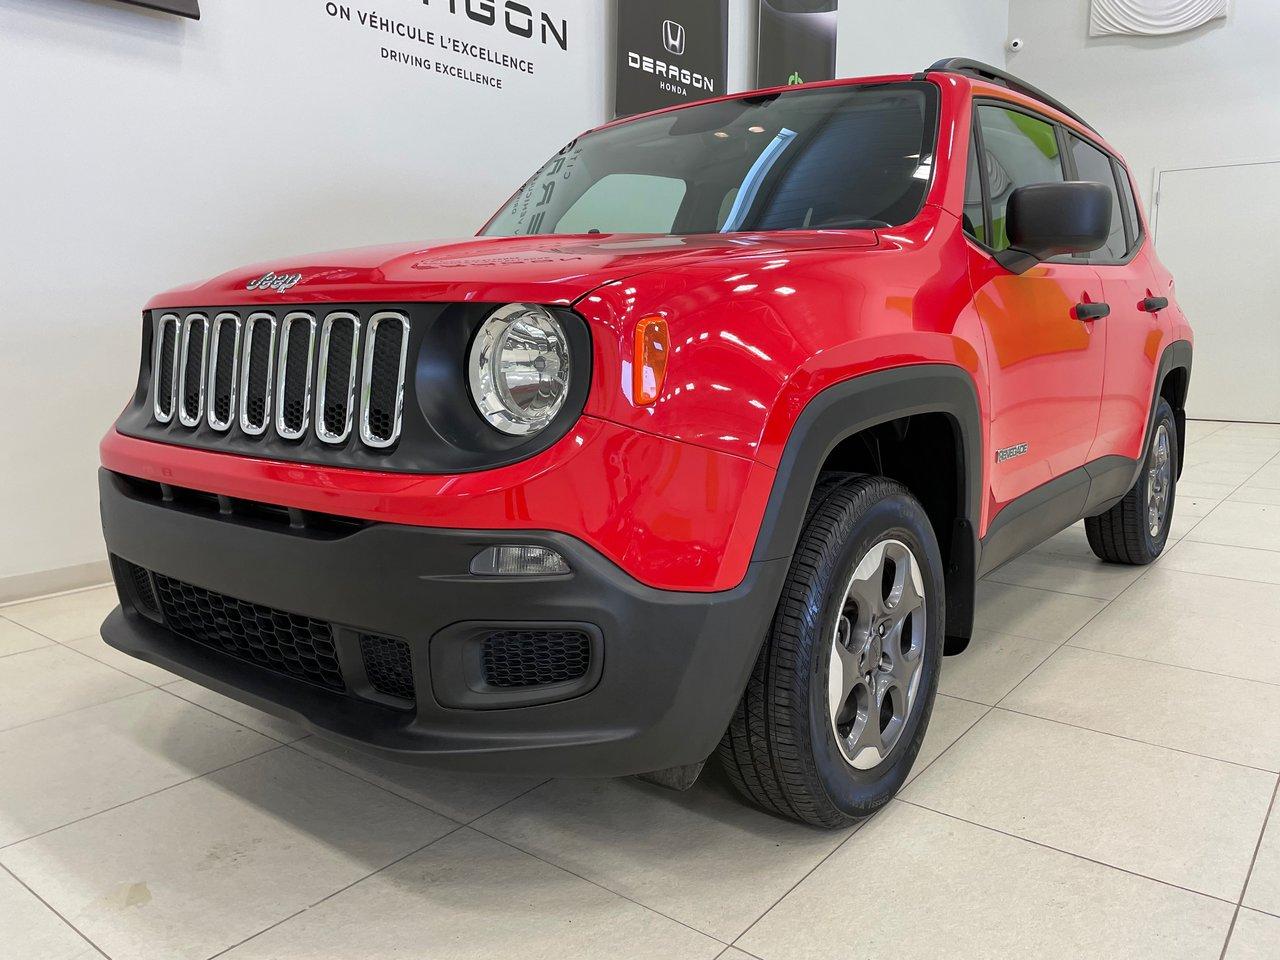 Jeep Renegade 2017 SPORT 4X4, CAMÉRA, ROUES 16, UN PROPRIÉTAIRE